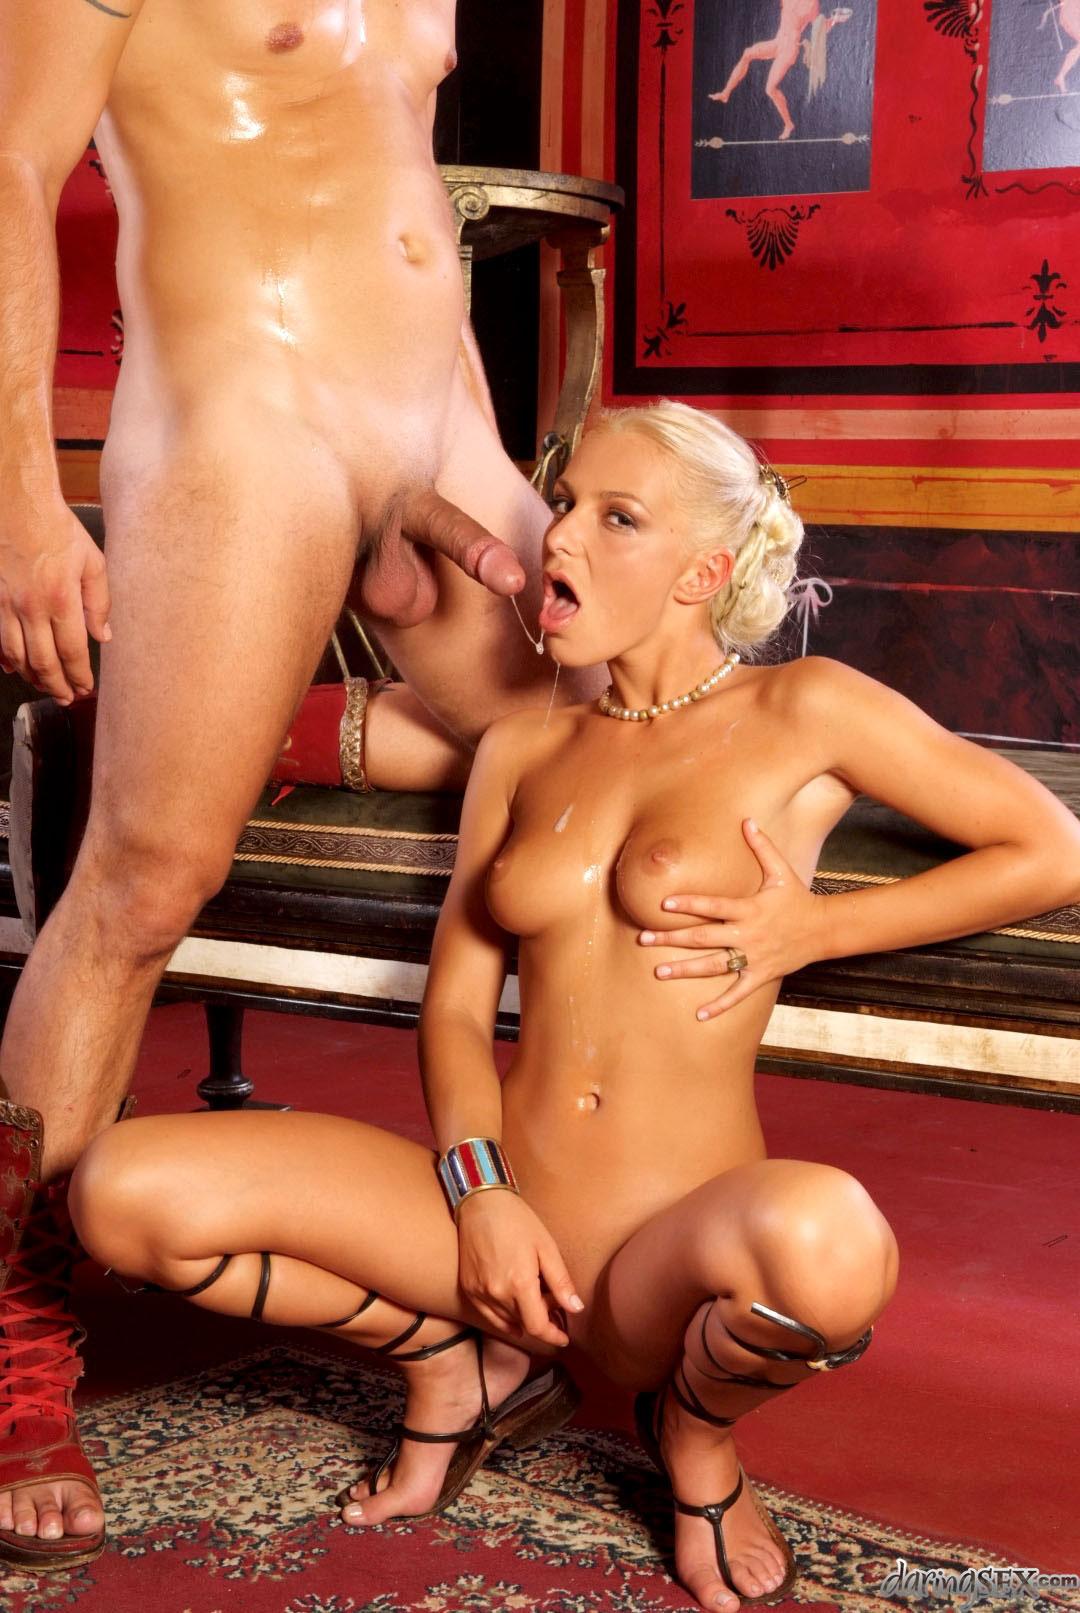 Actriz Porno Andrea Italiana daring sex andrea moranty & jennifer love 206630 - good sex porn